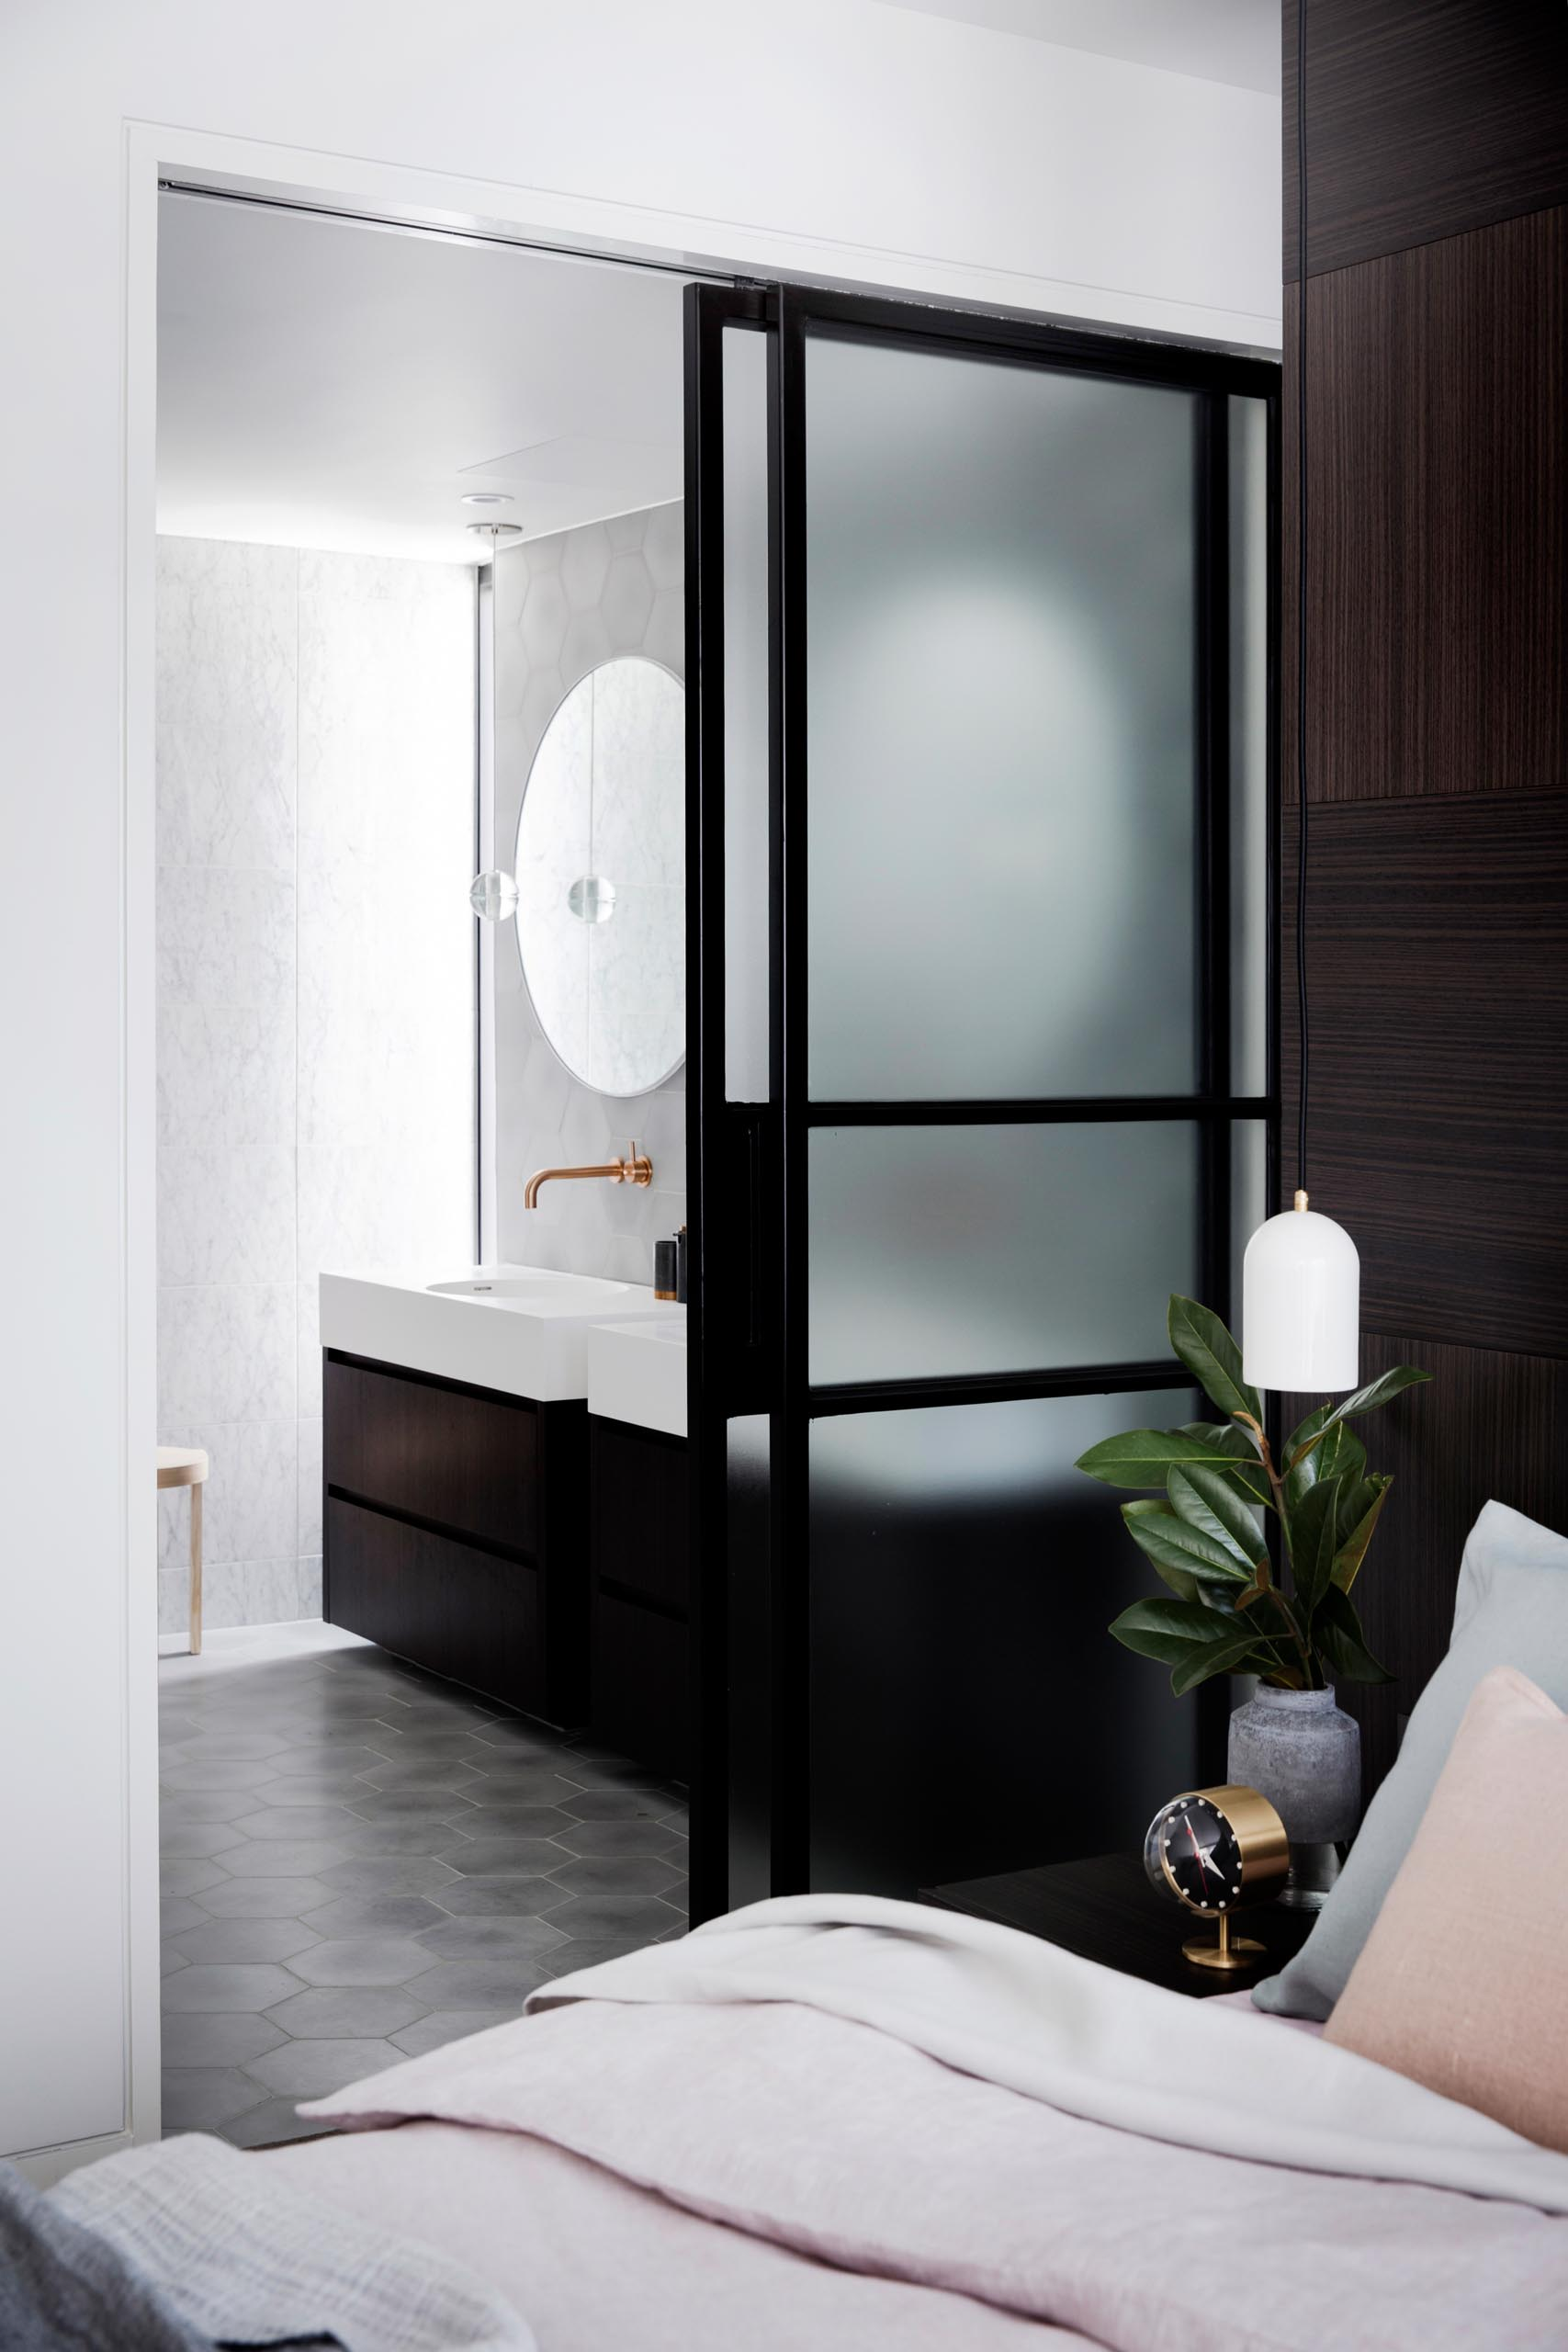 A black framed frosted glass door that slides open to reveal a modern en-suite bathroom.